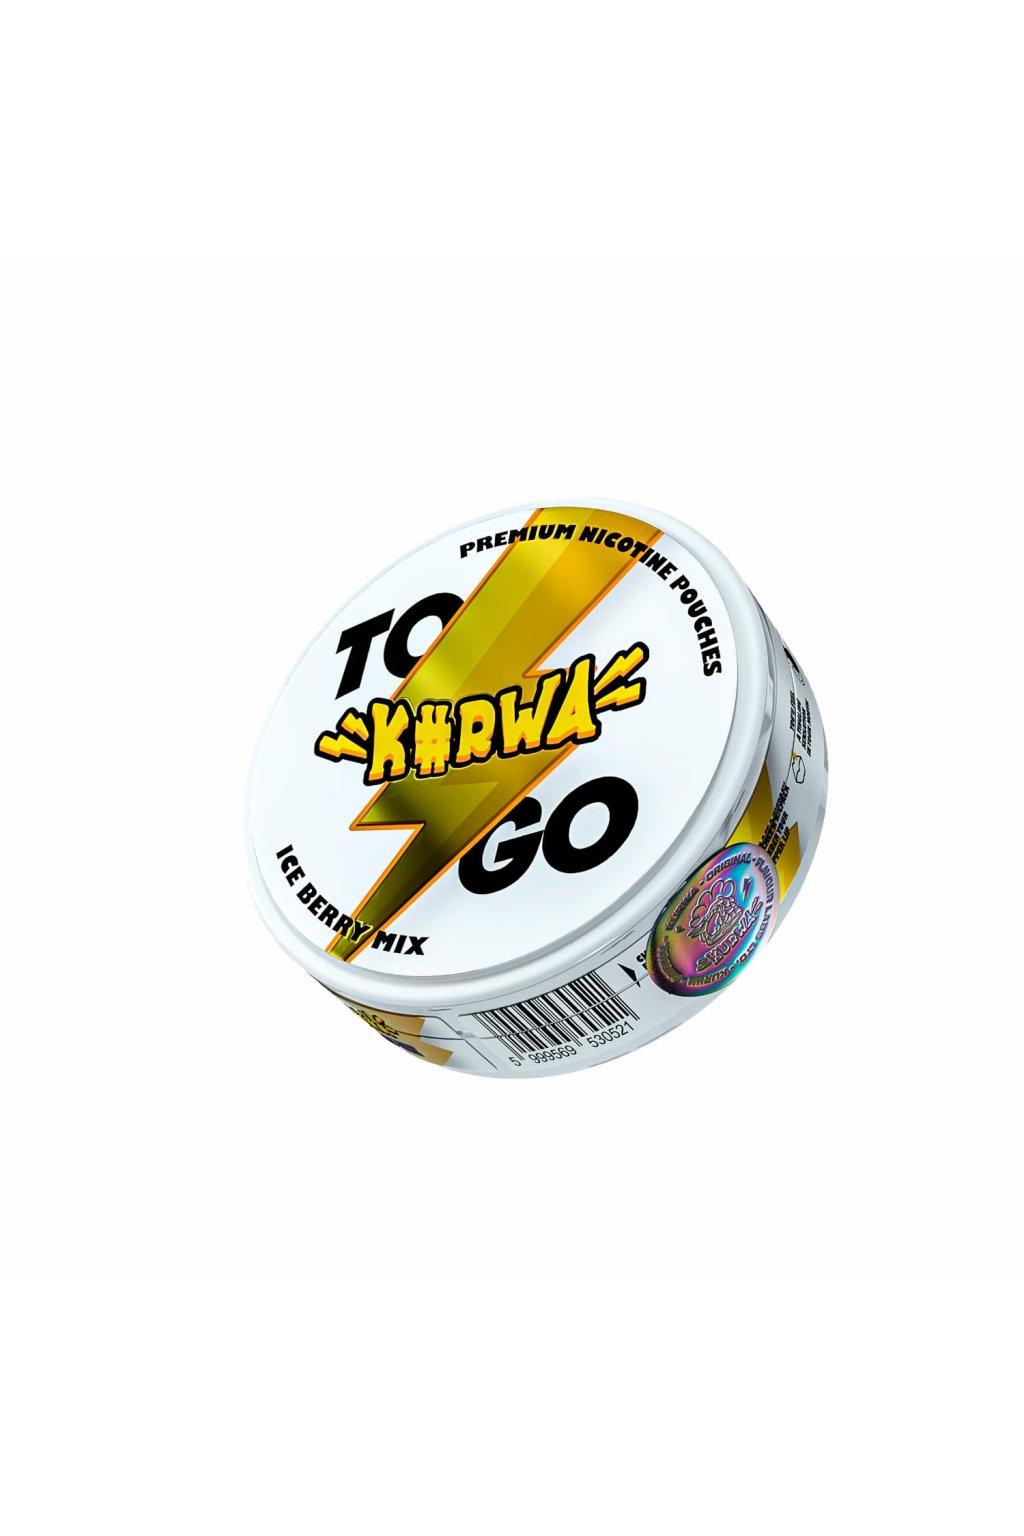 Kurwa to go ice berry mix nikotinove sacky